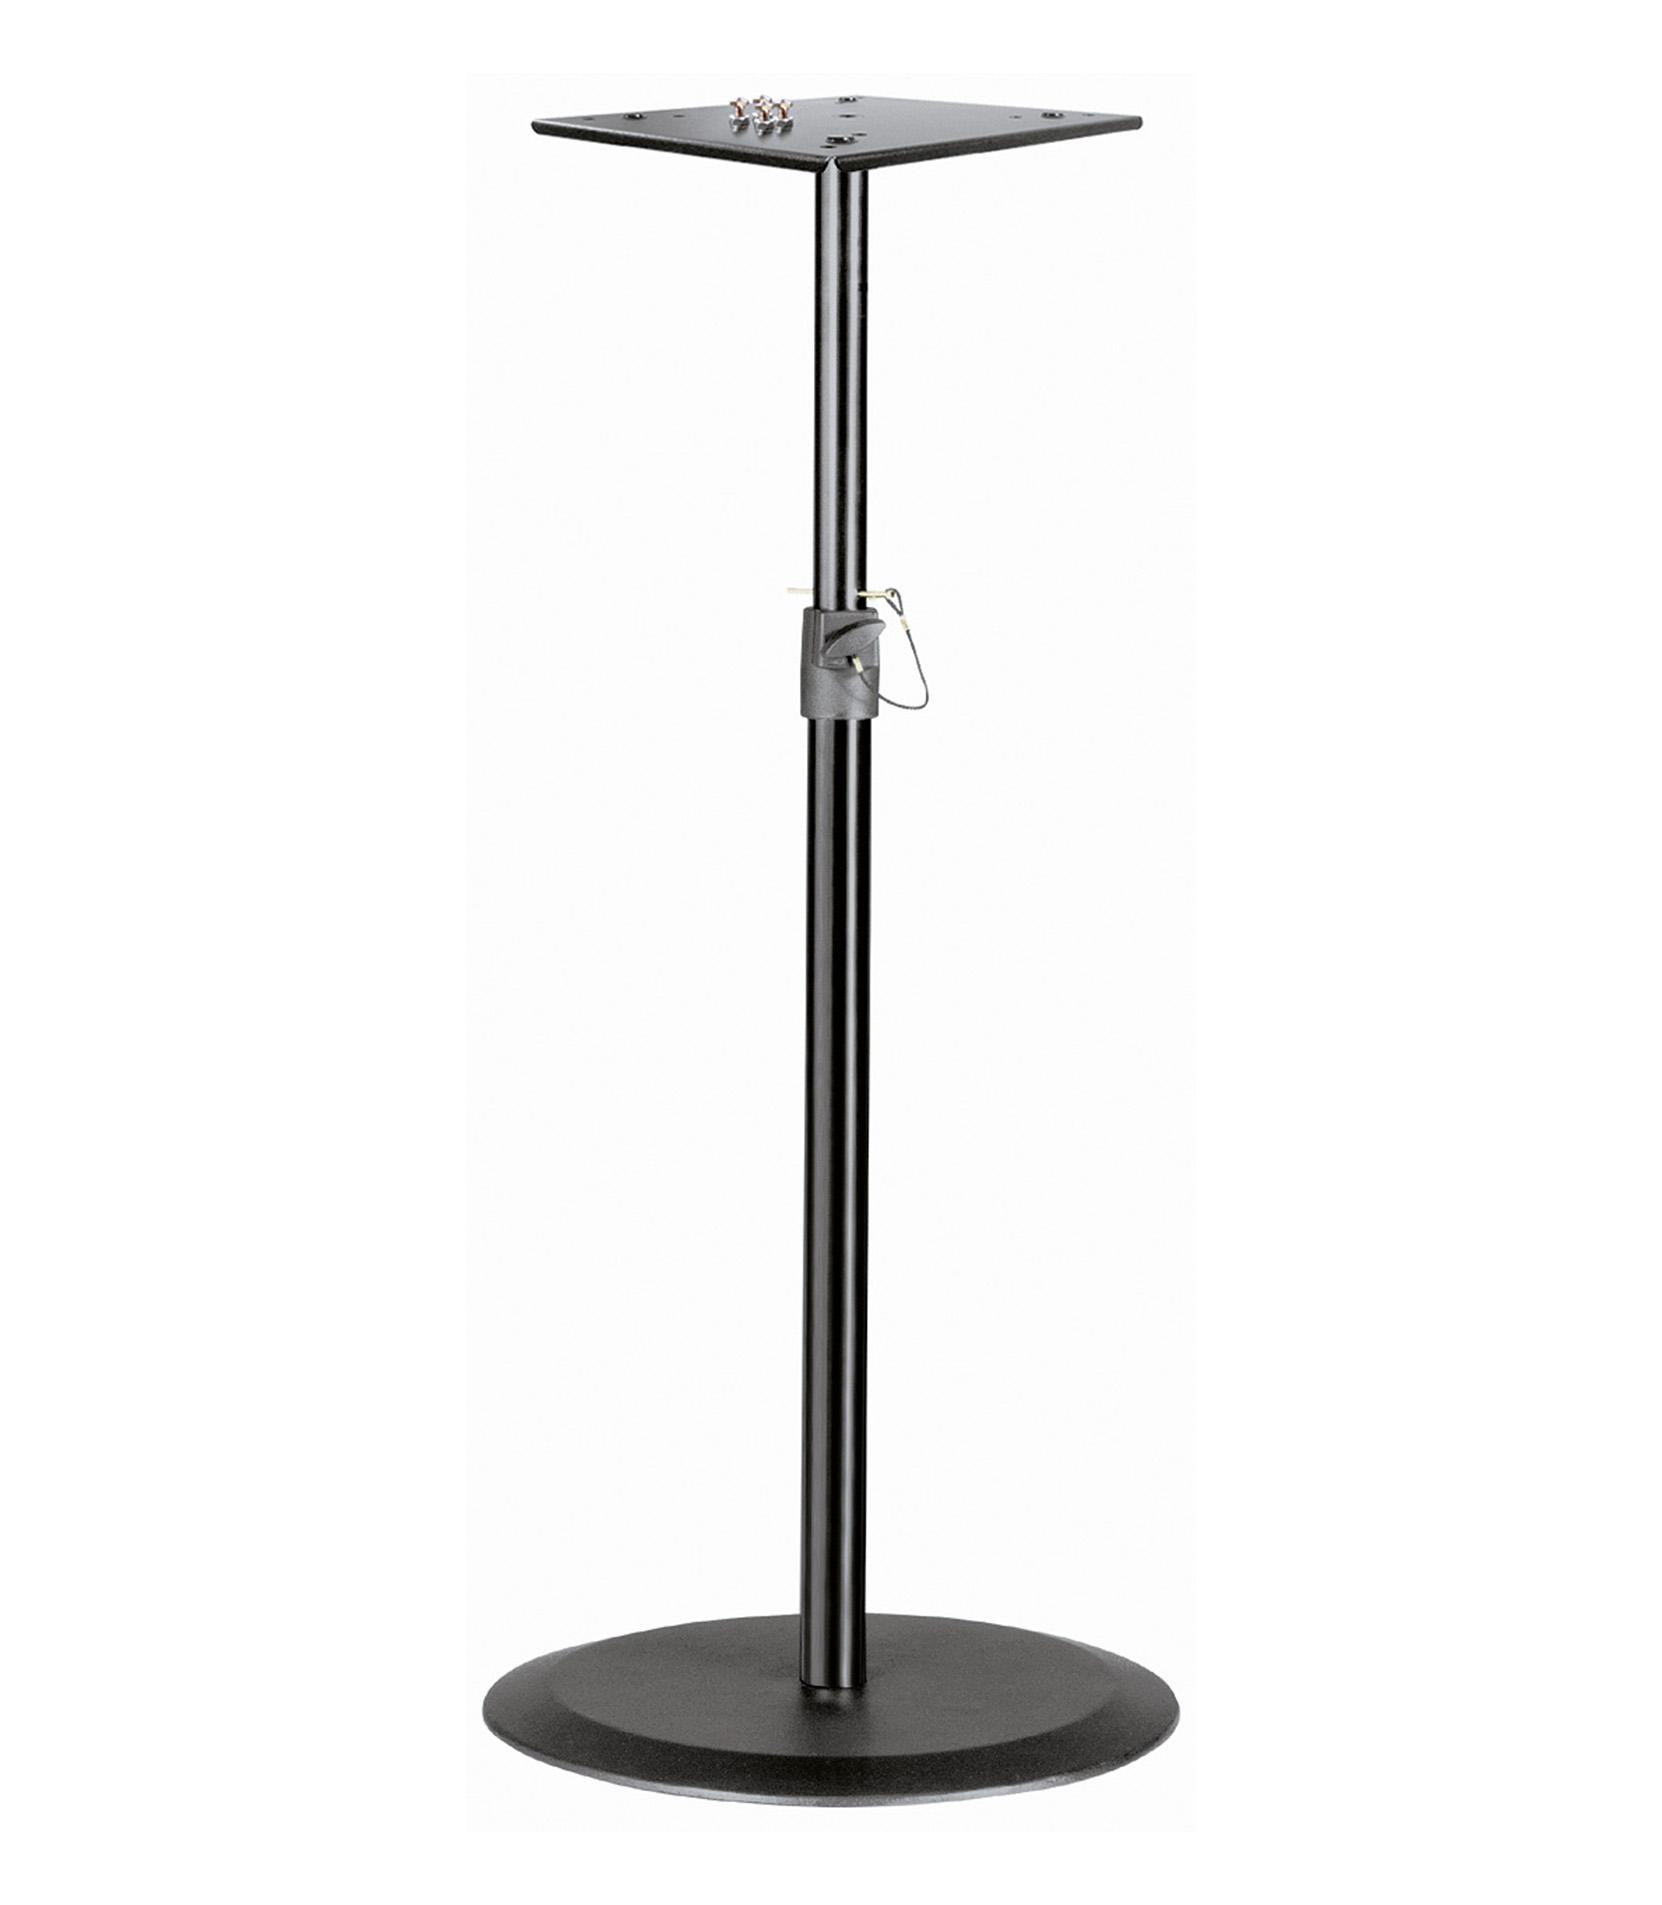 buy k&m 26740 000 55 steel monitor stand black